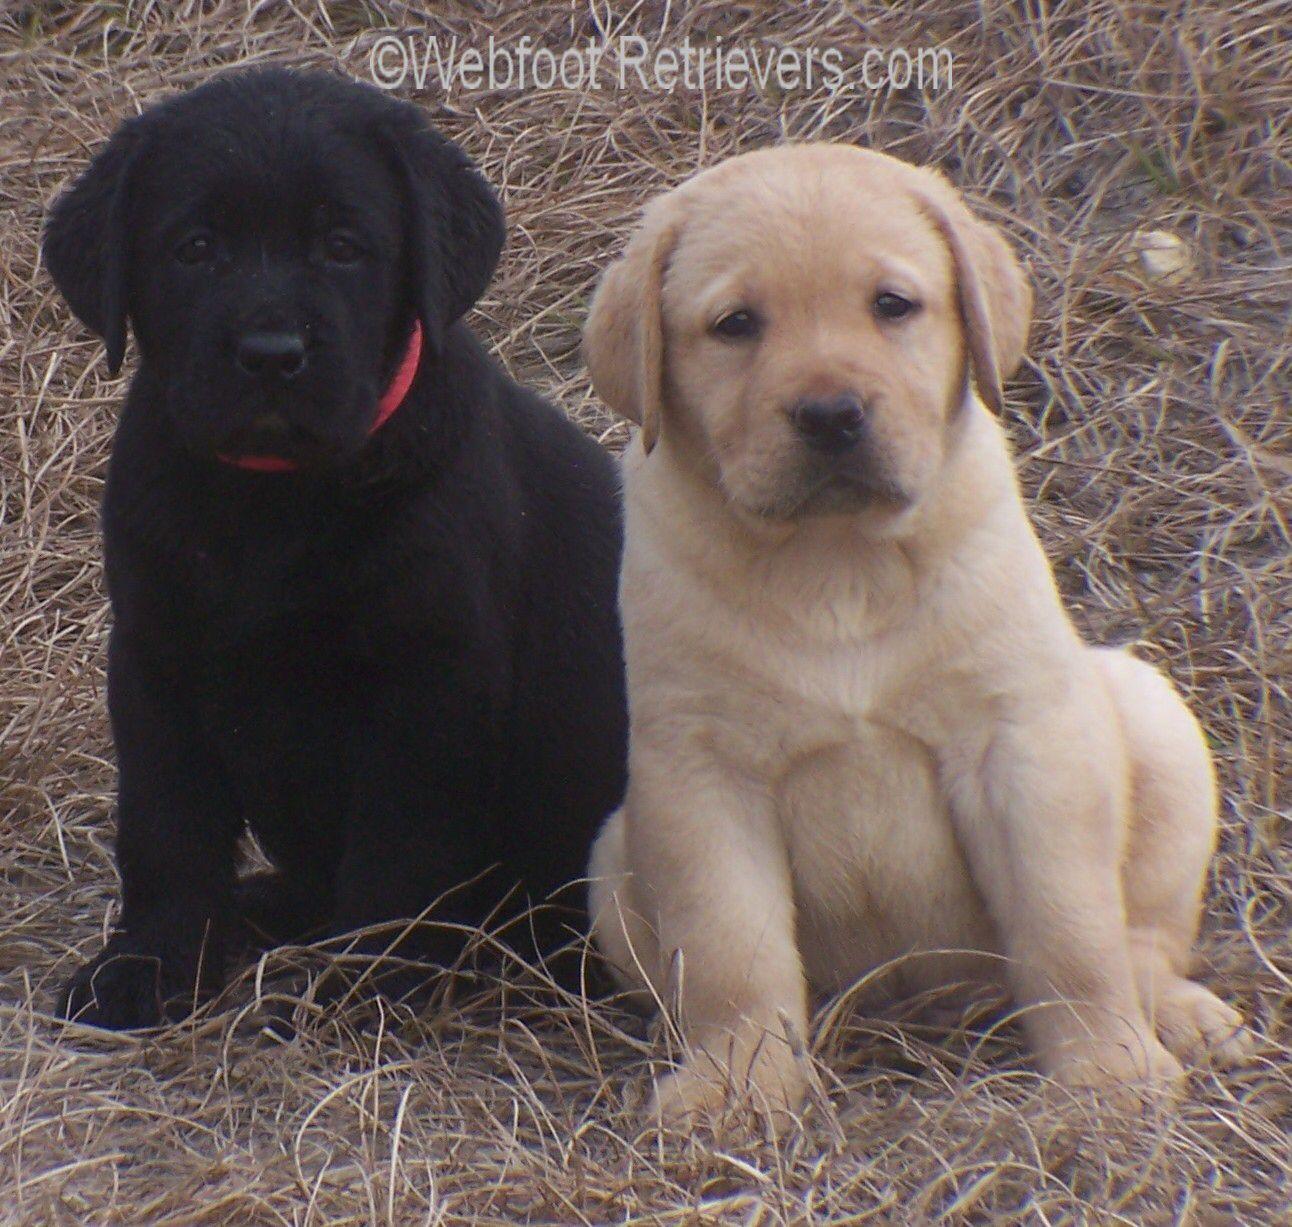 Labrador Puppies For Sale Labrador Puppies For Sale Ms Labradors